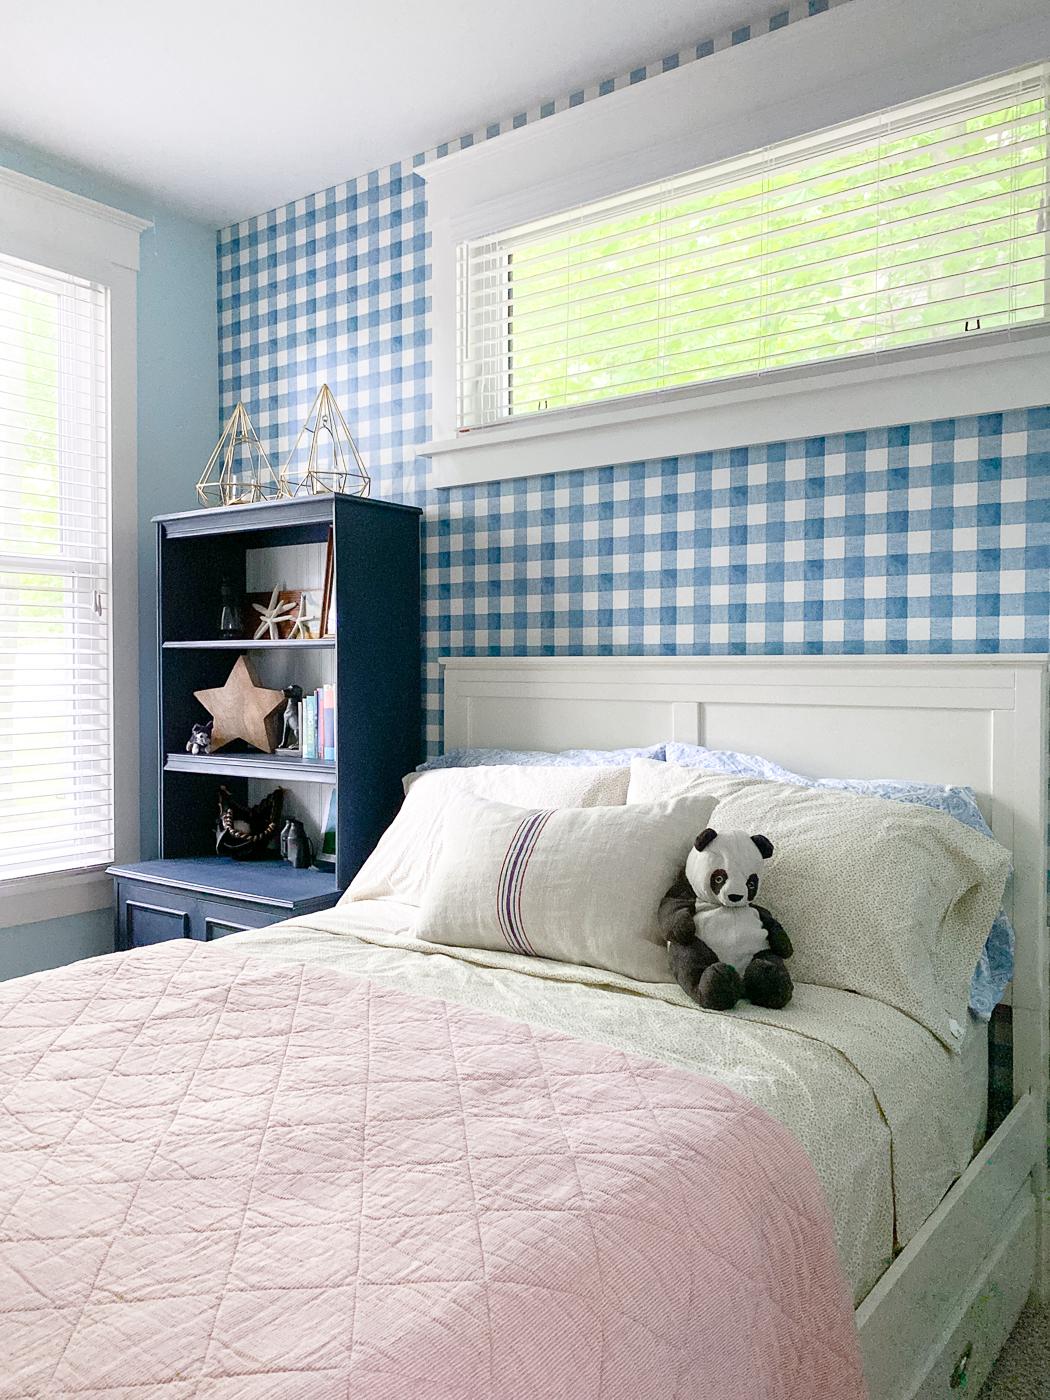 summer cottage decorating ideas, summer cottage decor, cottage decorating ideas kids room